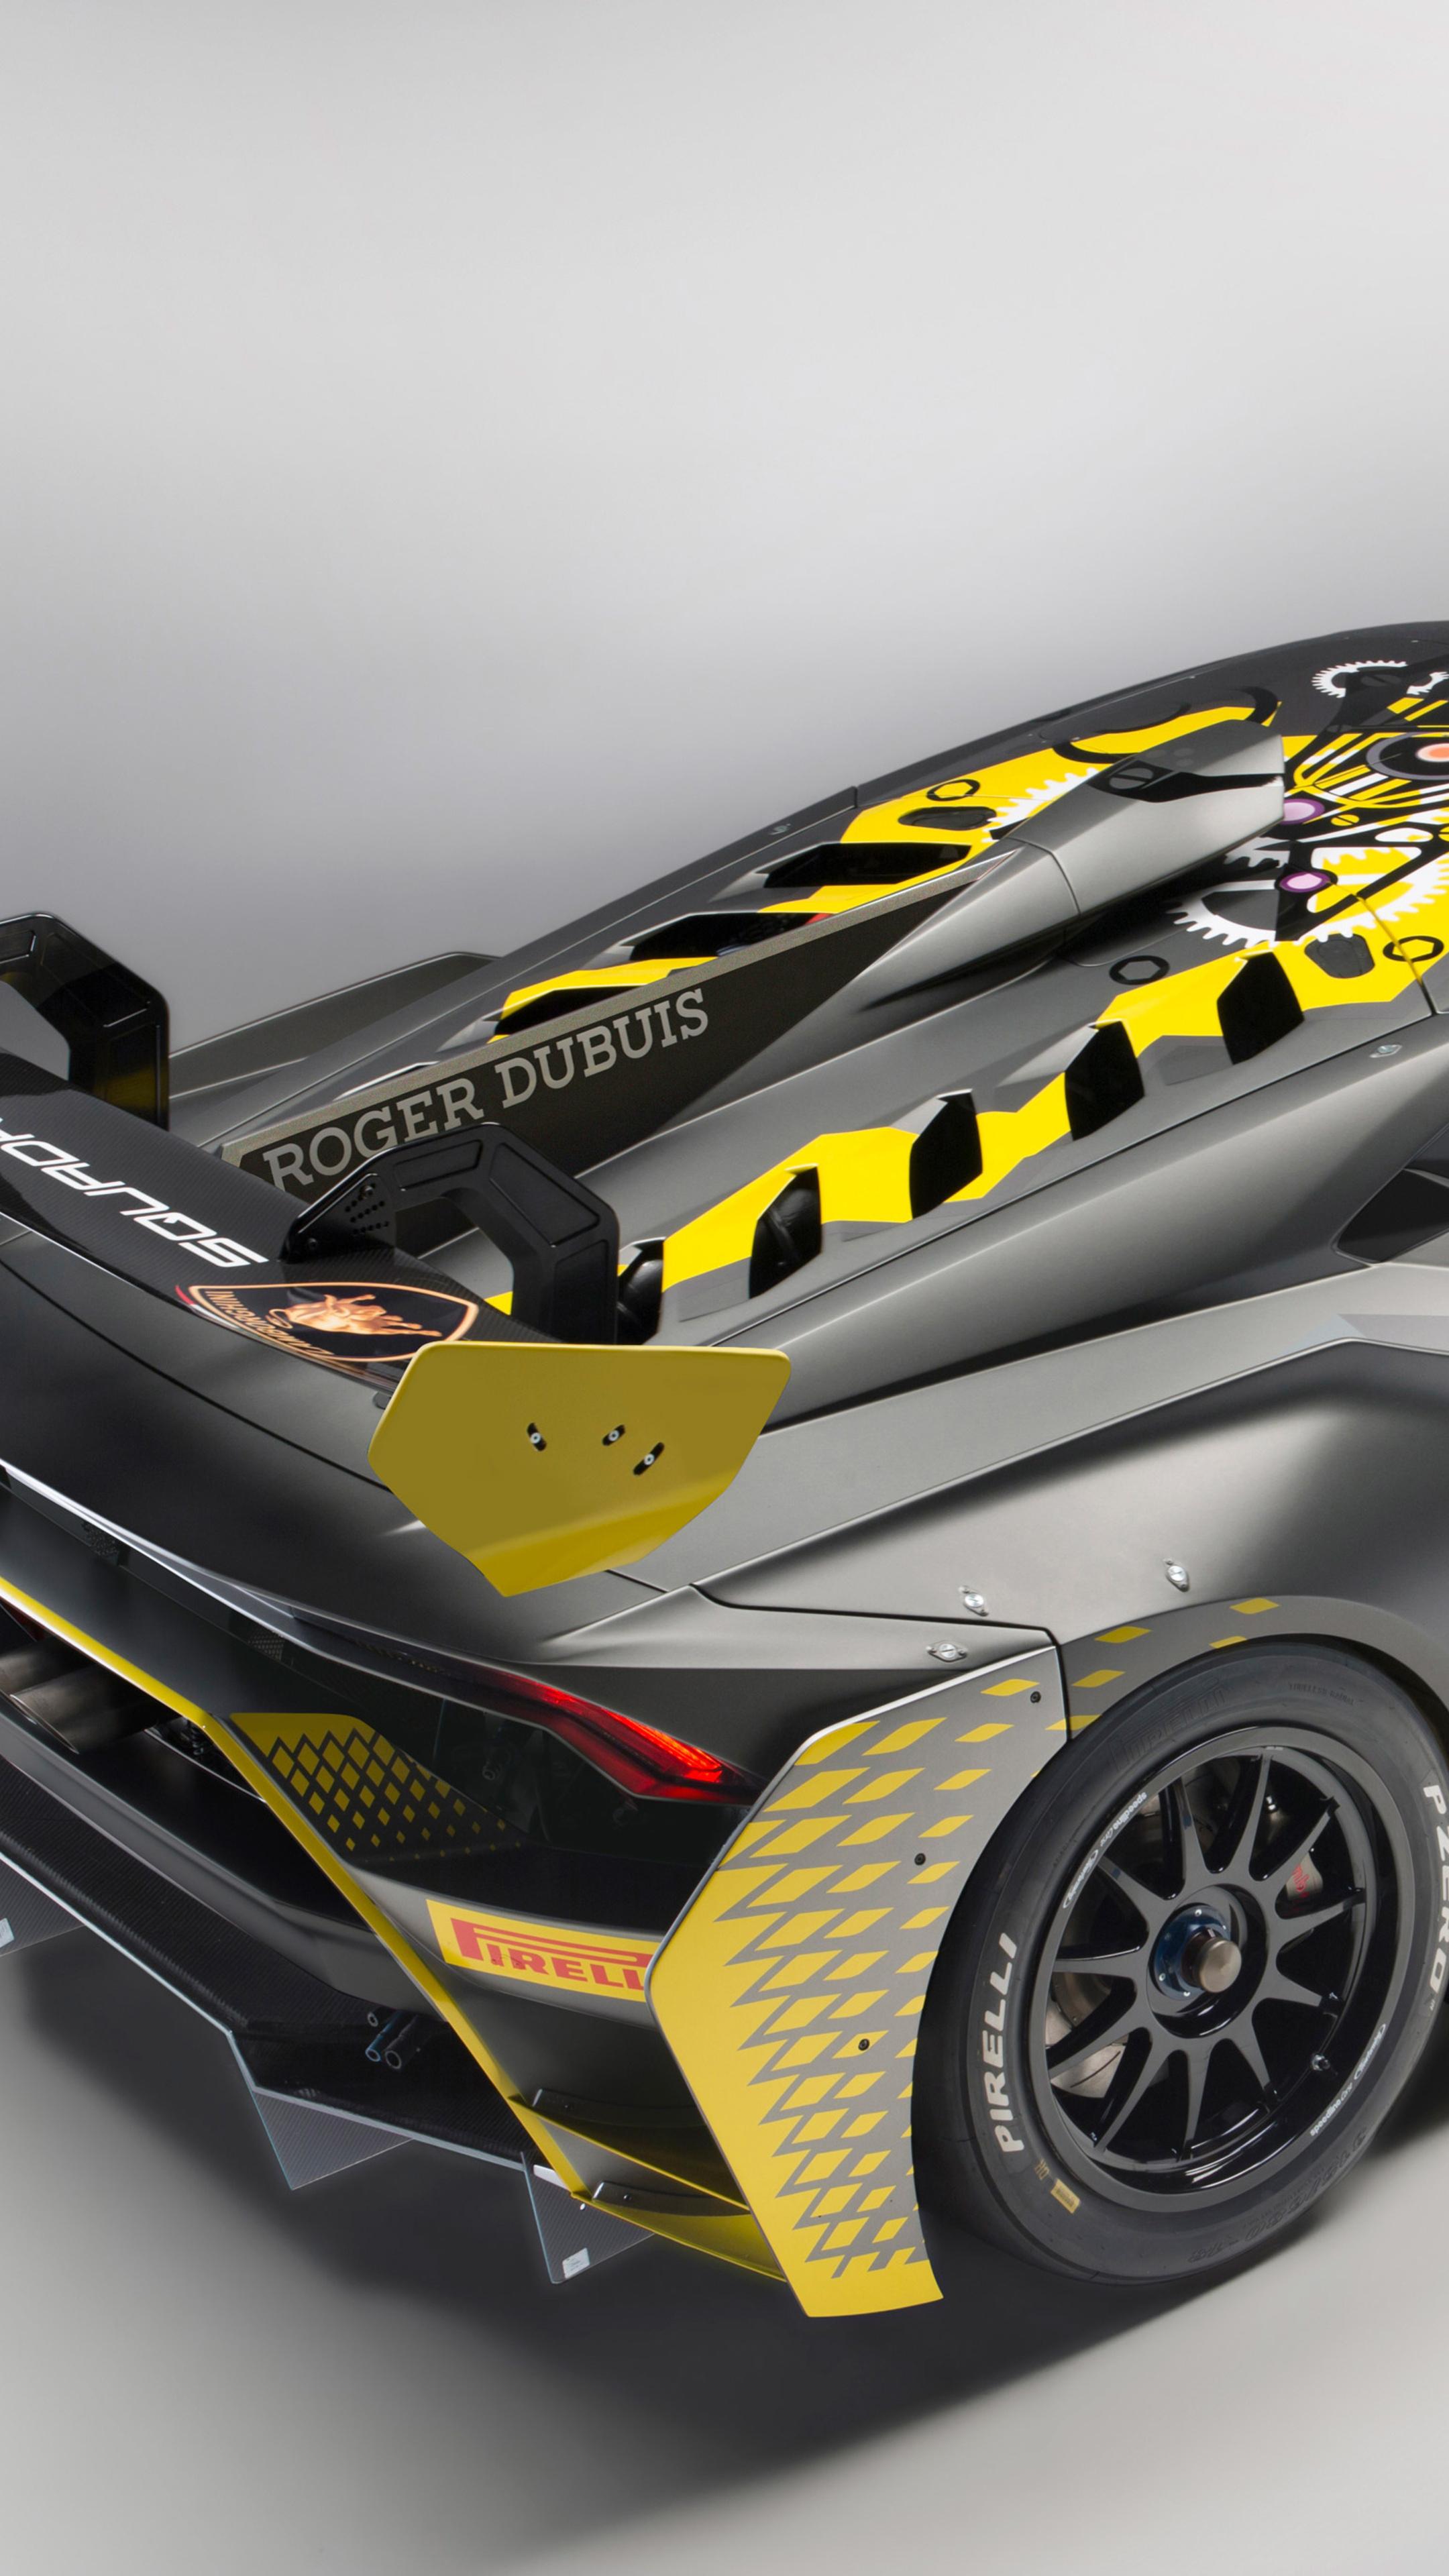 Lamborghini Huracan Super Trofeo Evo 2018 Rear Tf.